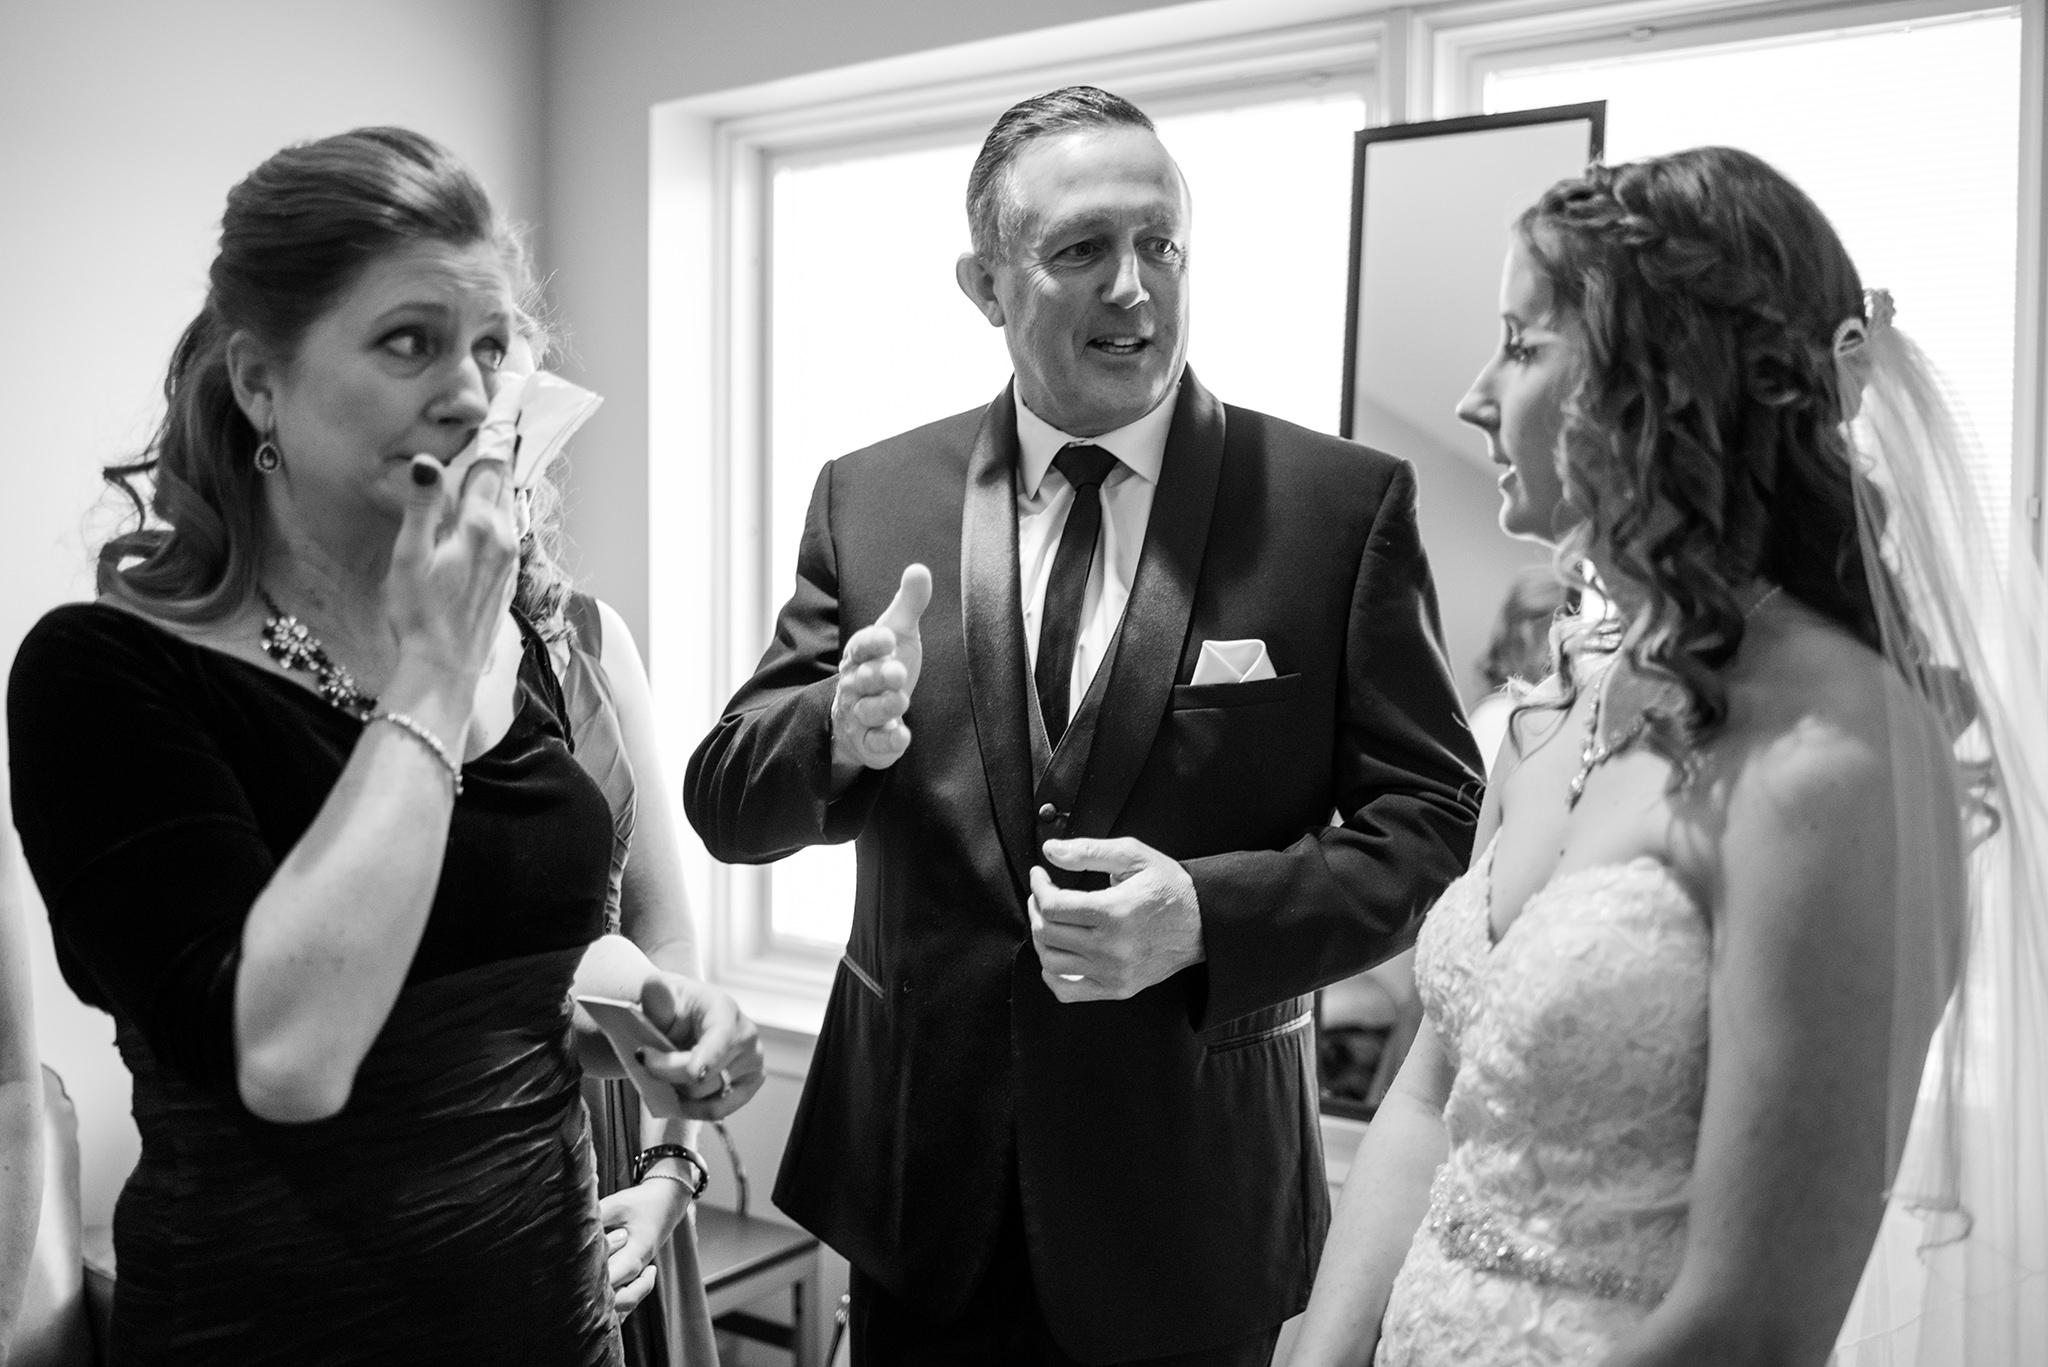 wedding-photography-studios-omaha-jm-studios-uno.jpg